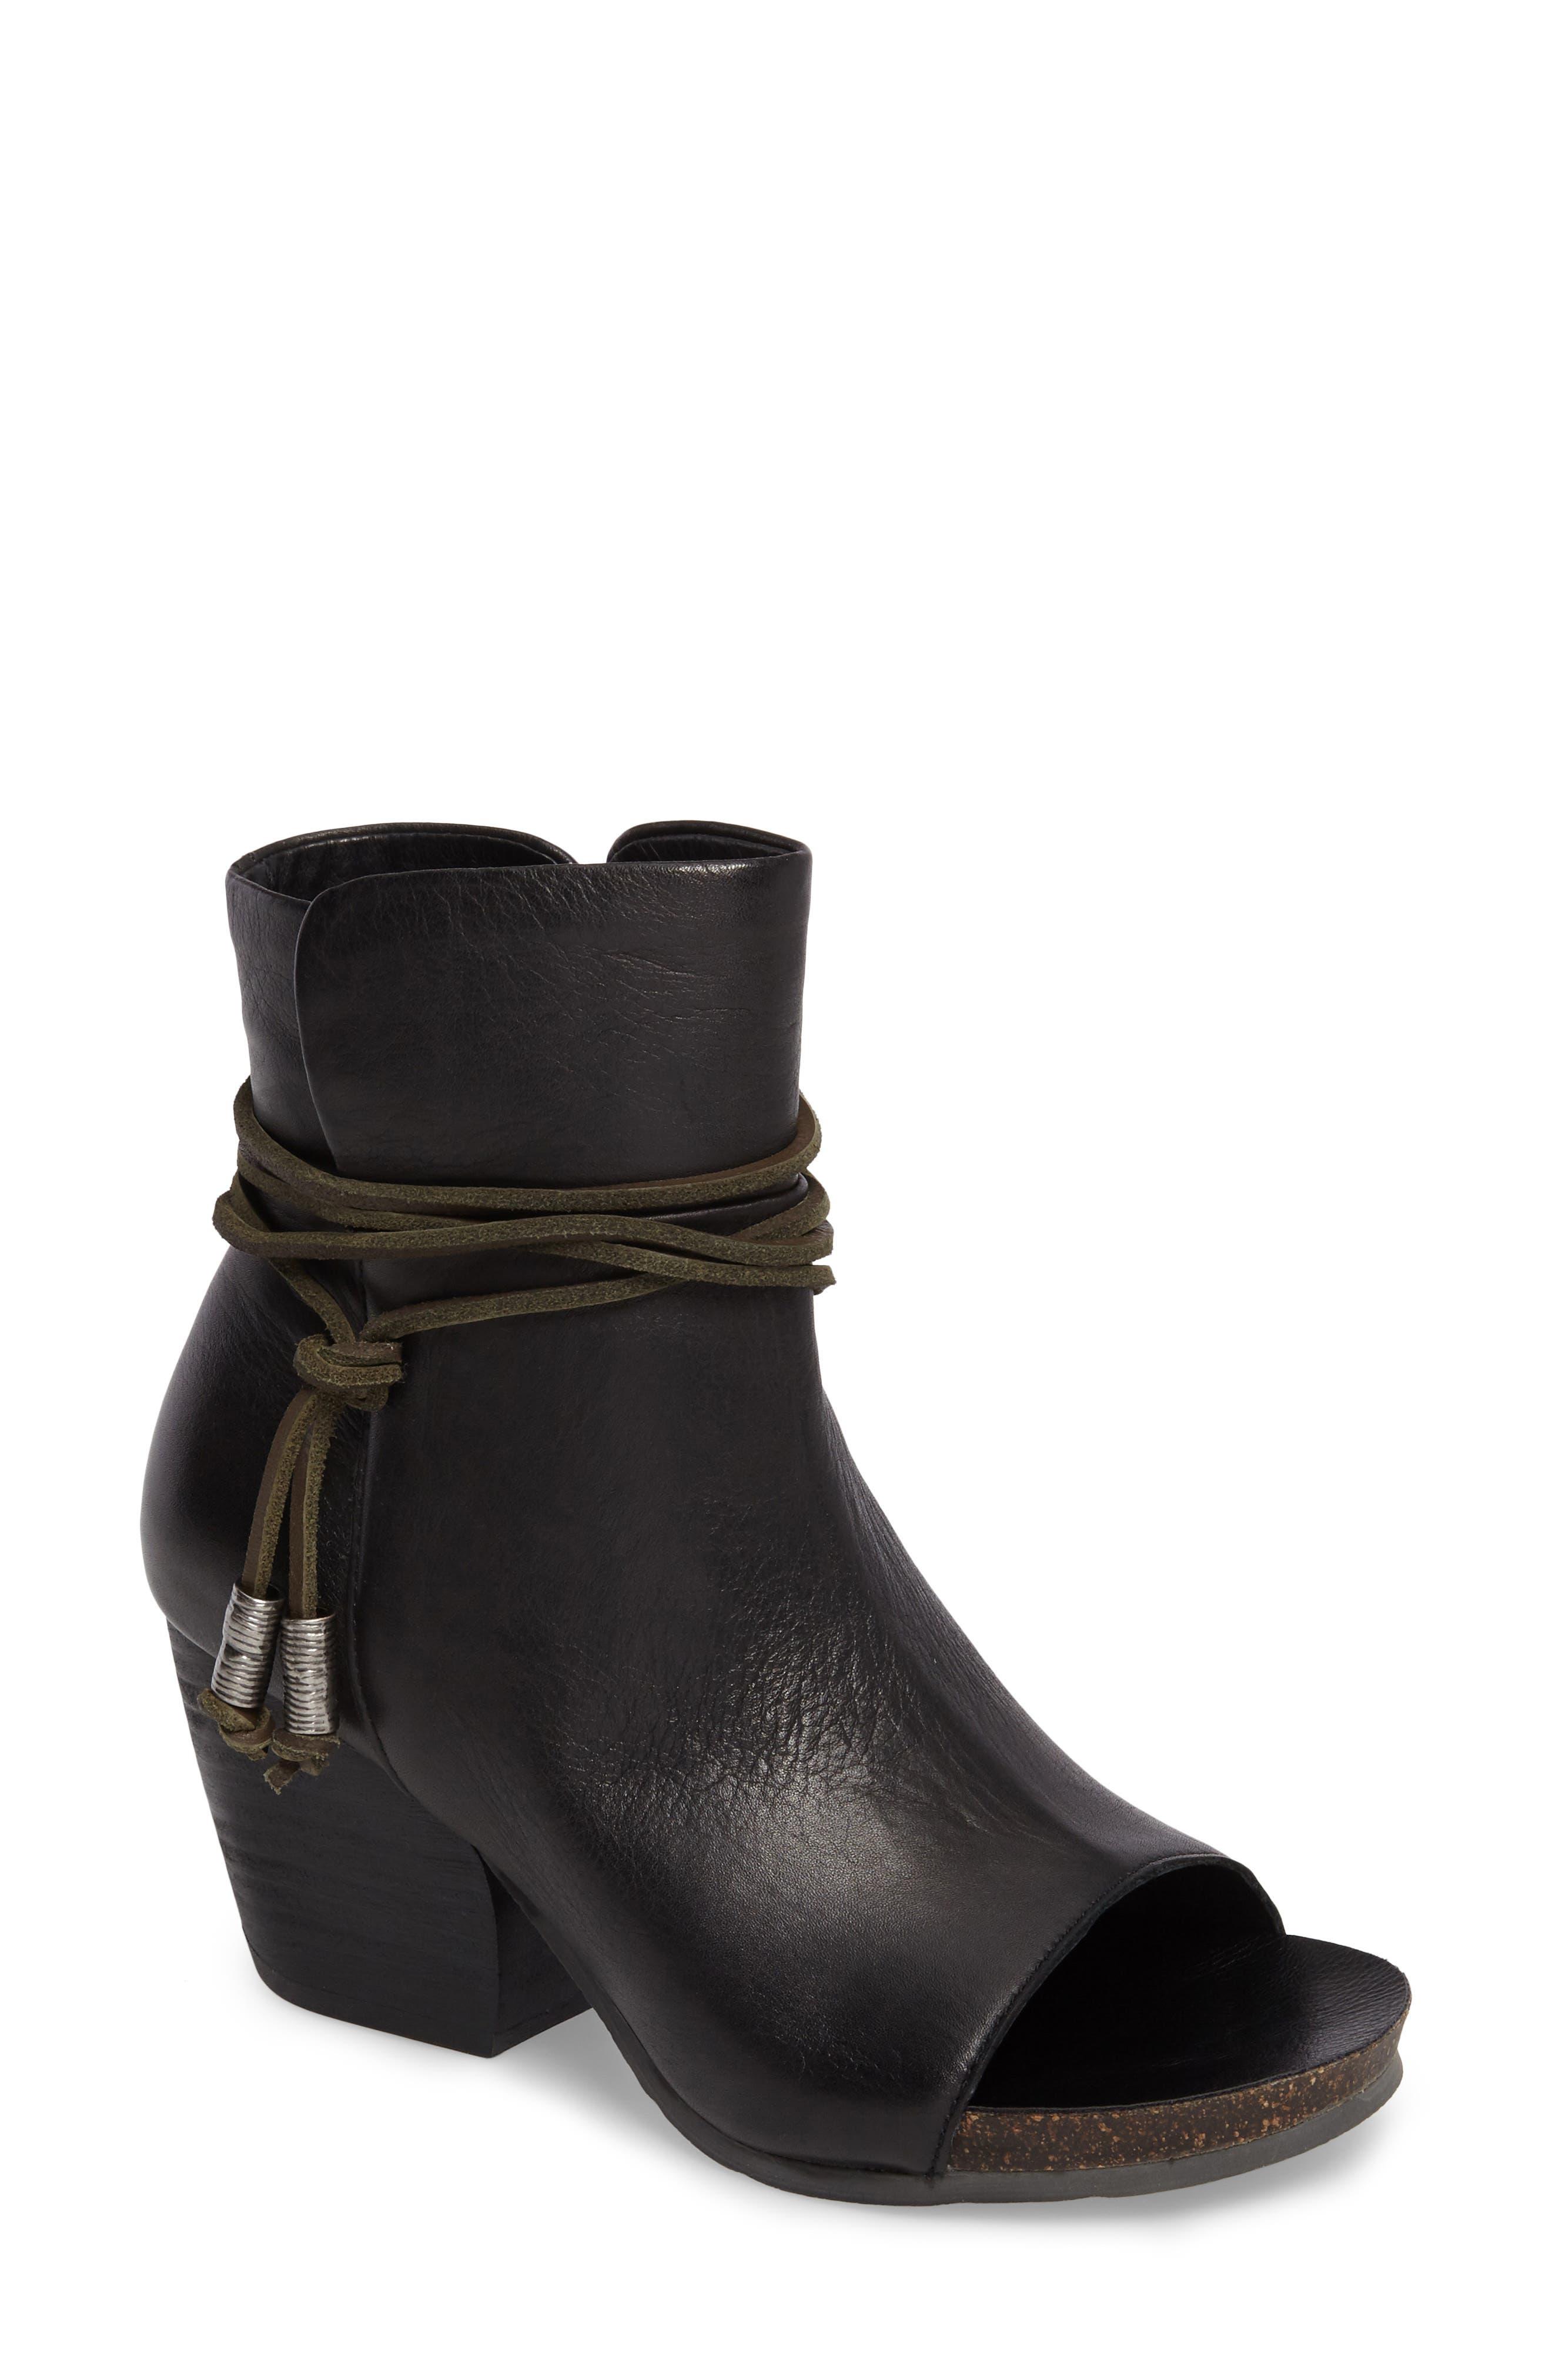 Open Toe Bootie,                         Main,                         color, BLACK LEATHER